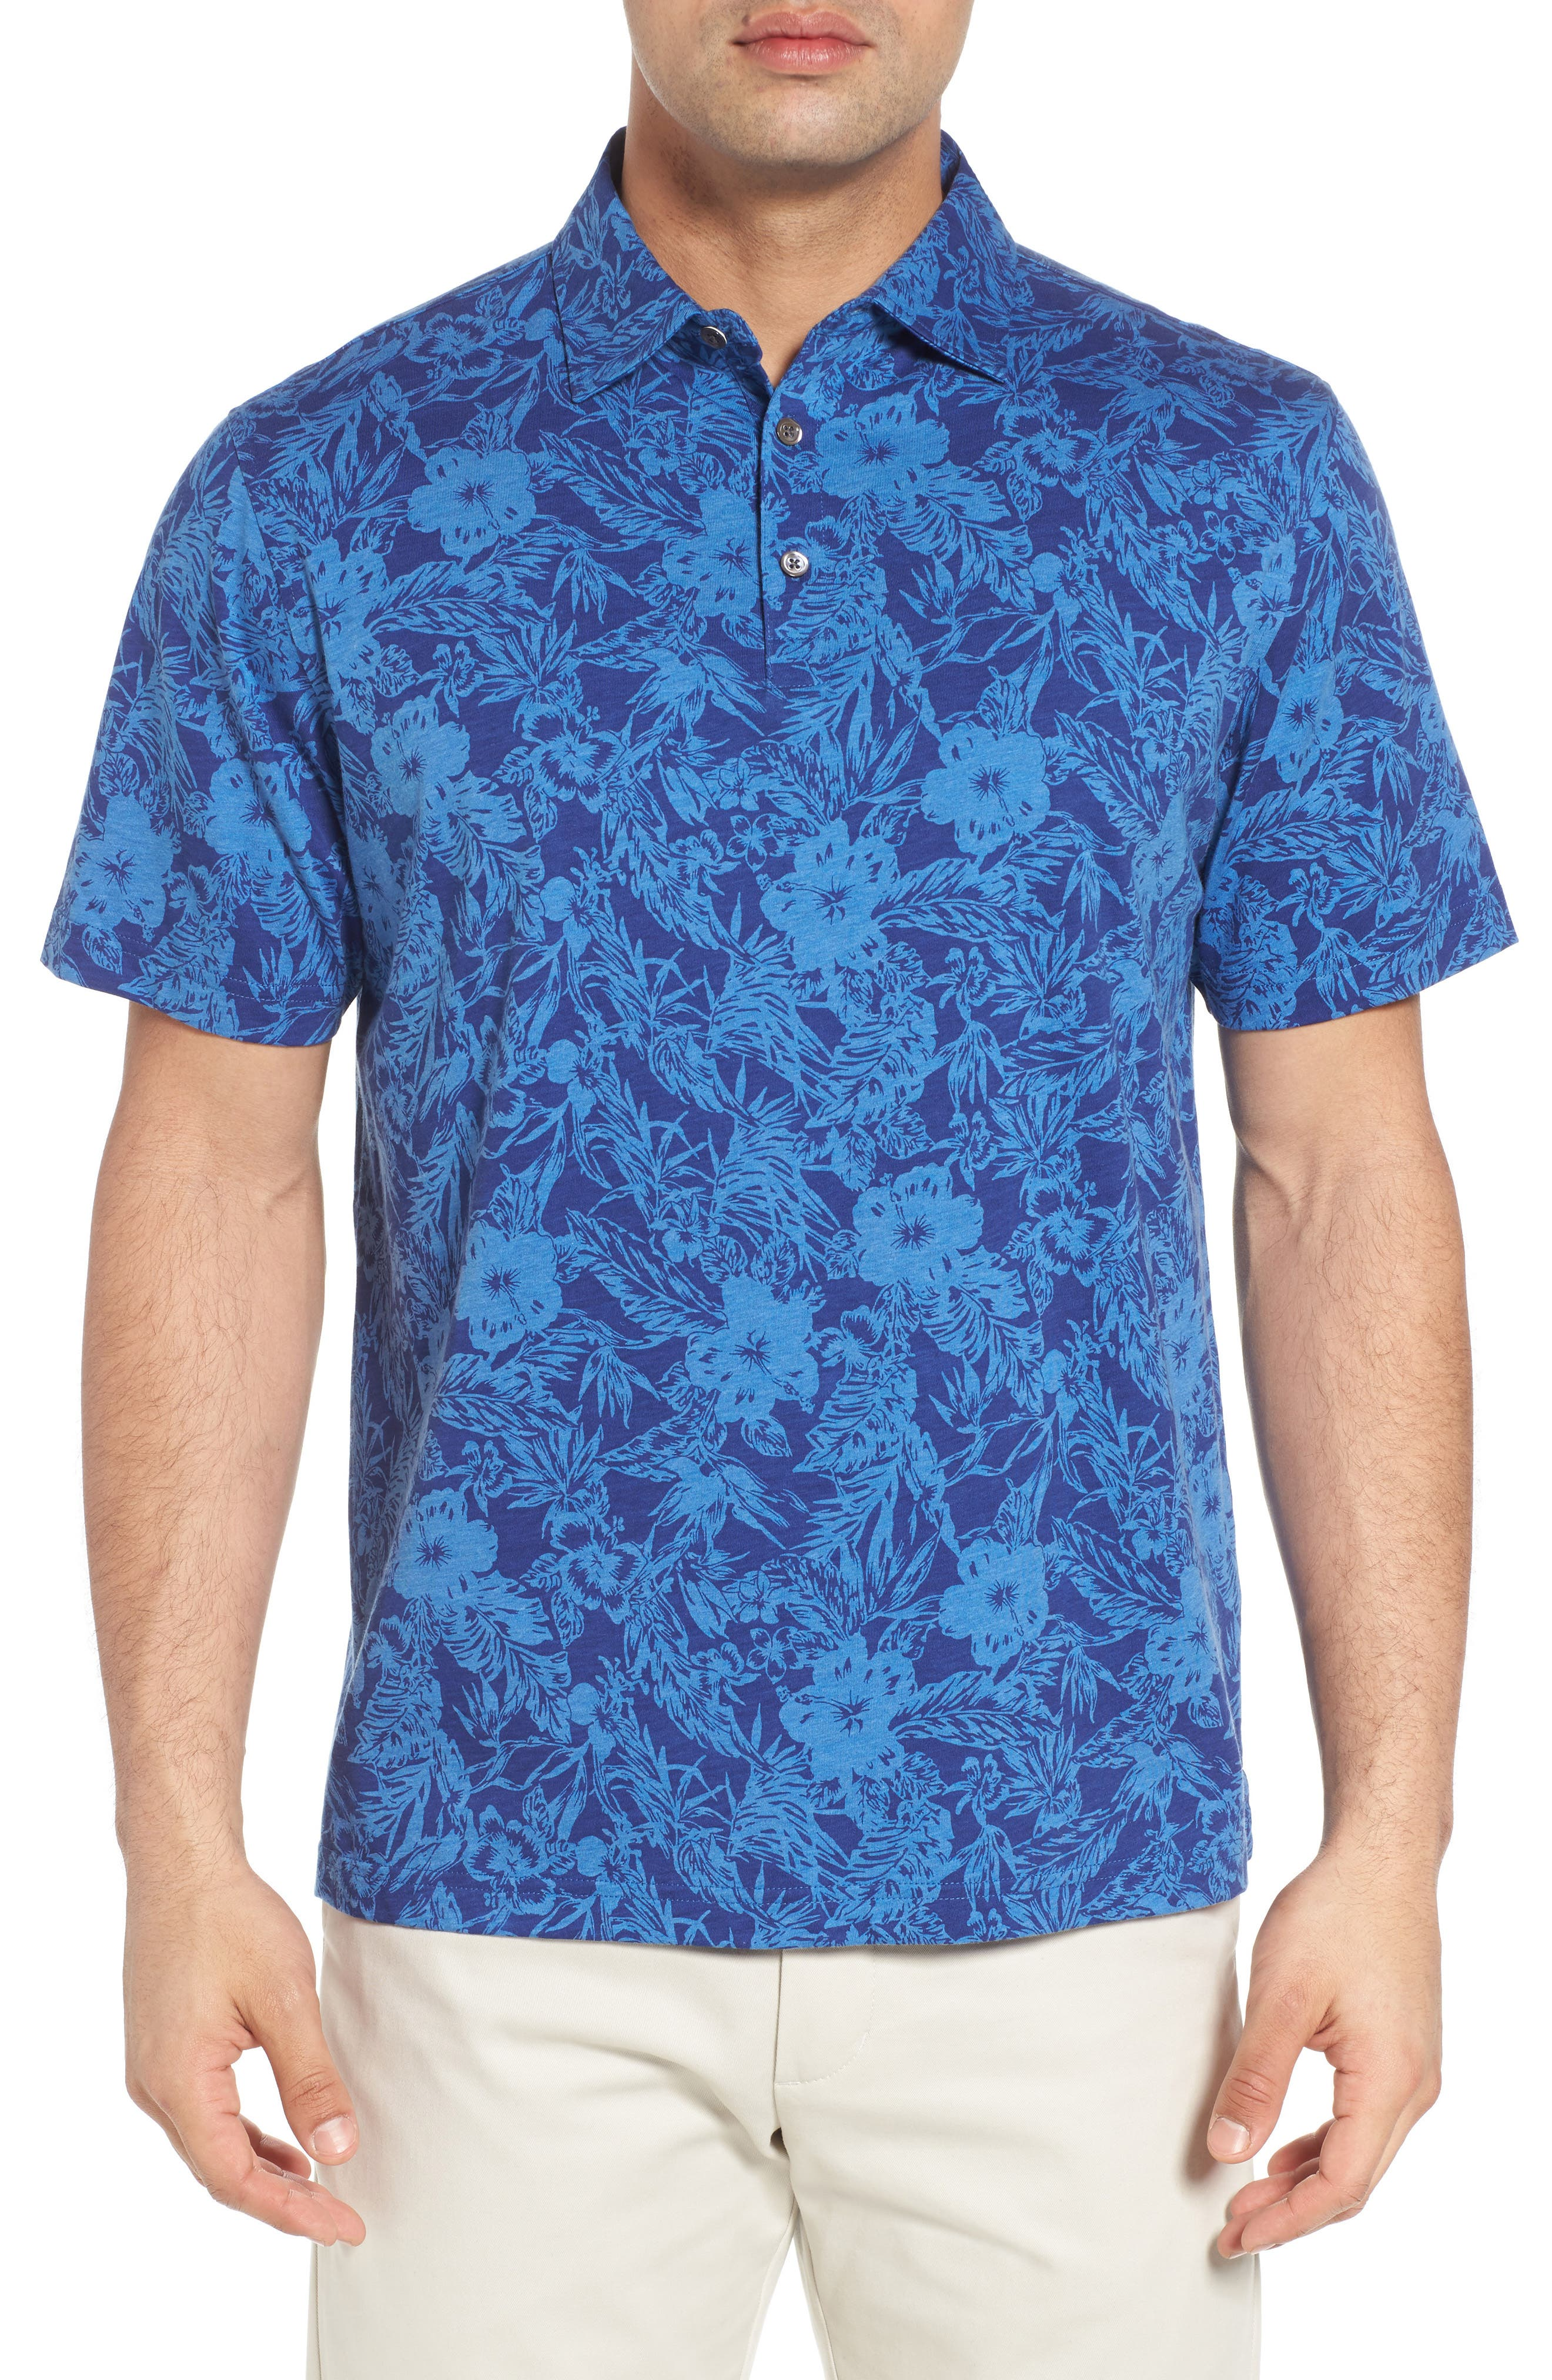 Alternate Image 1 Selected - Peter Millar Crown Floral Cotton & Silk Polo Shirt